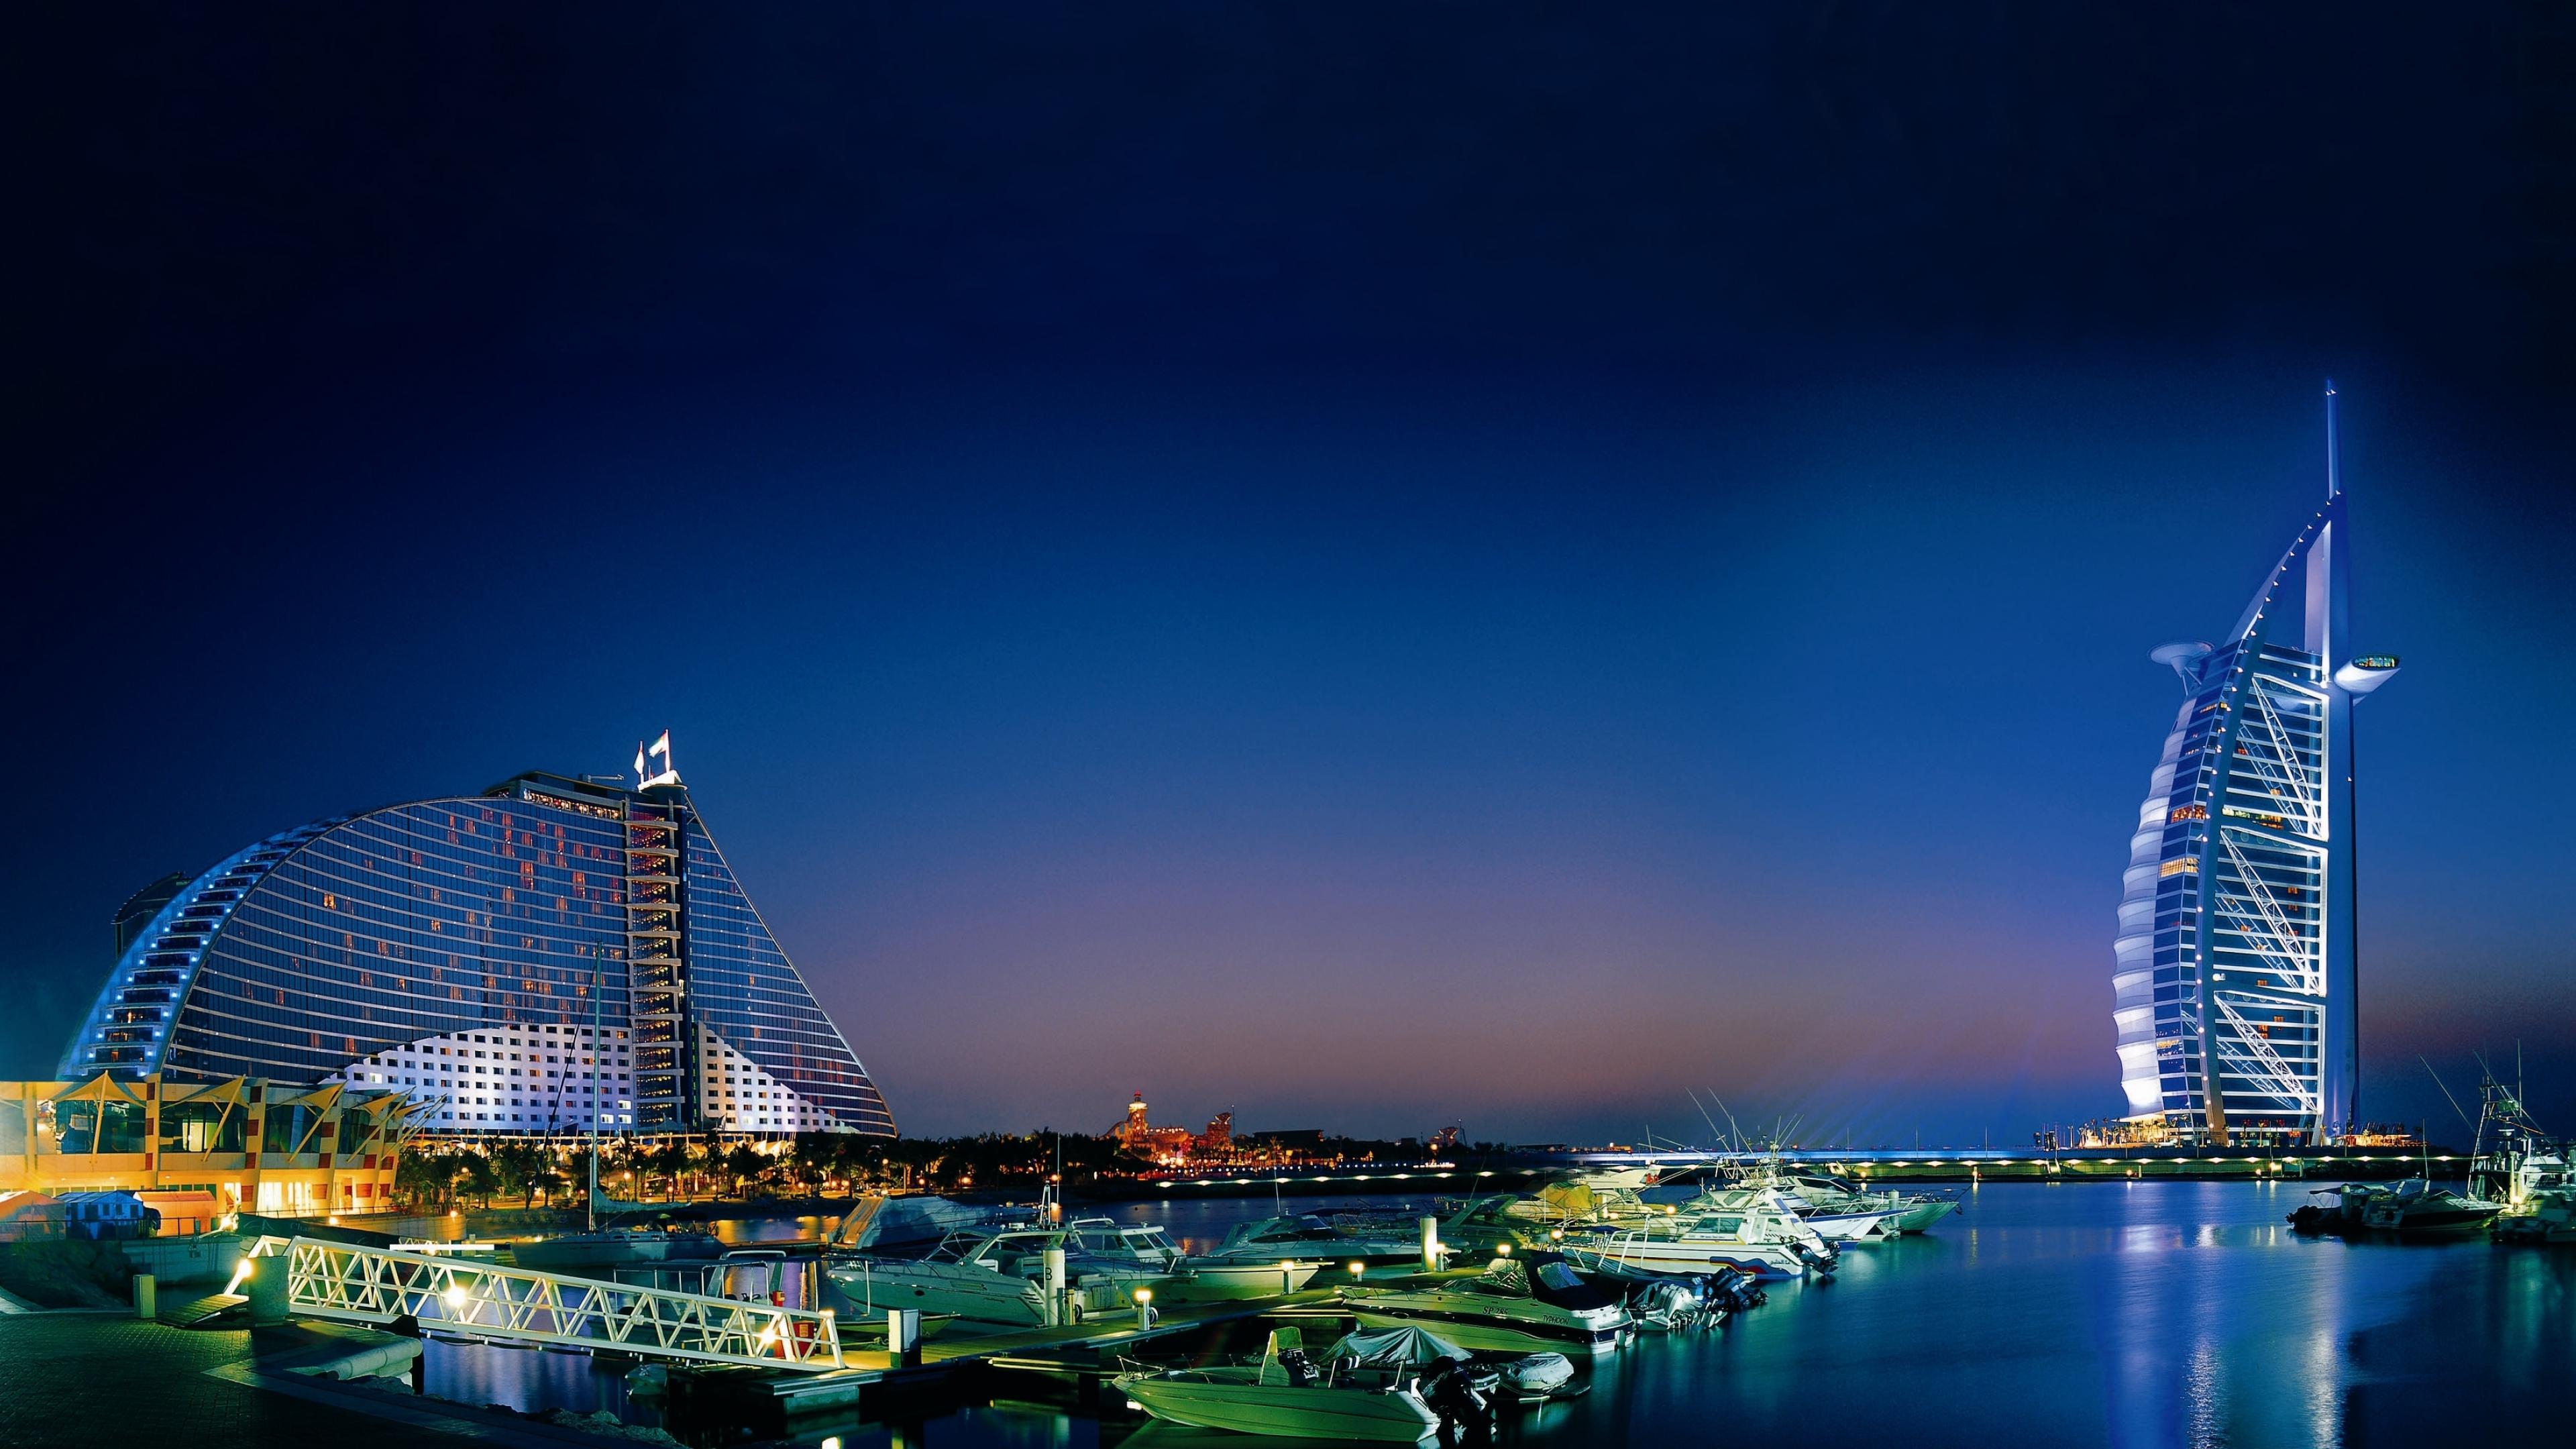 Burj Al Arab Dubai, United Arab Emirates 4k Ultra HD ...